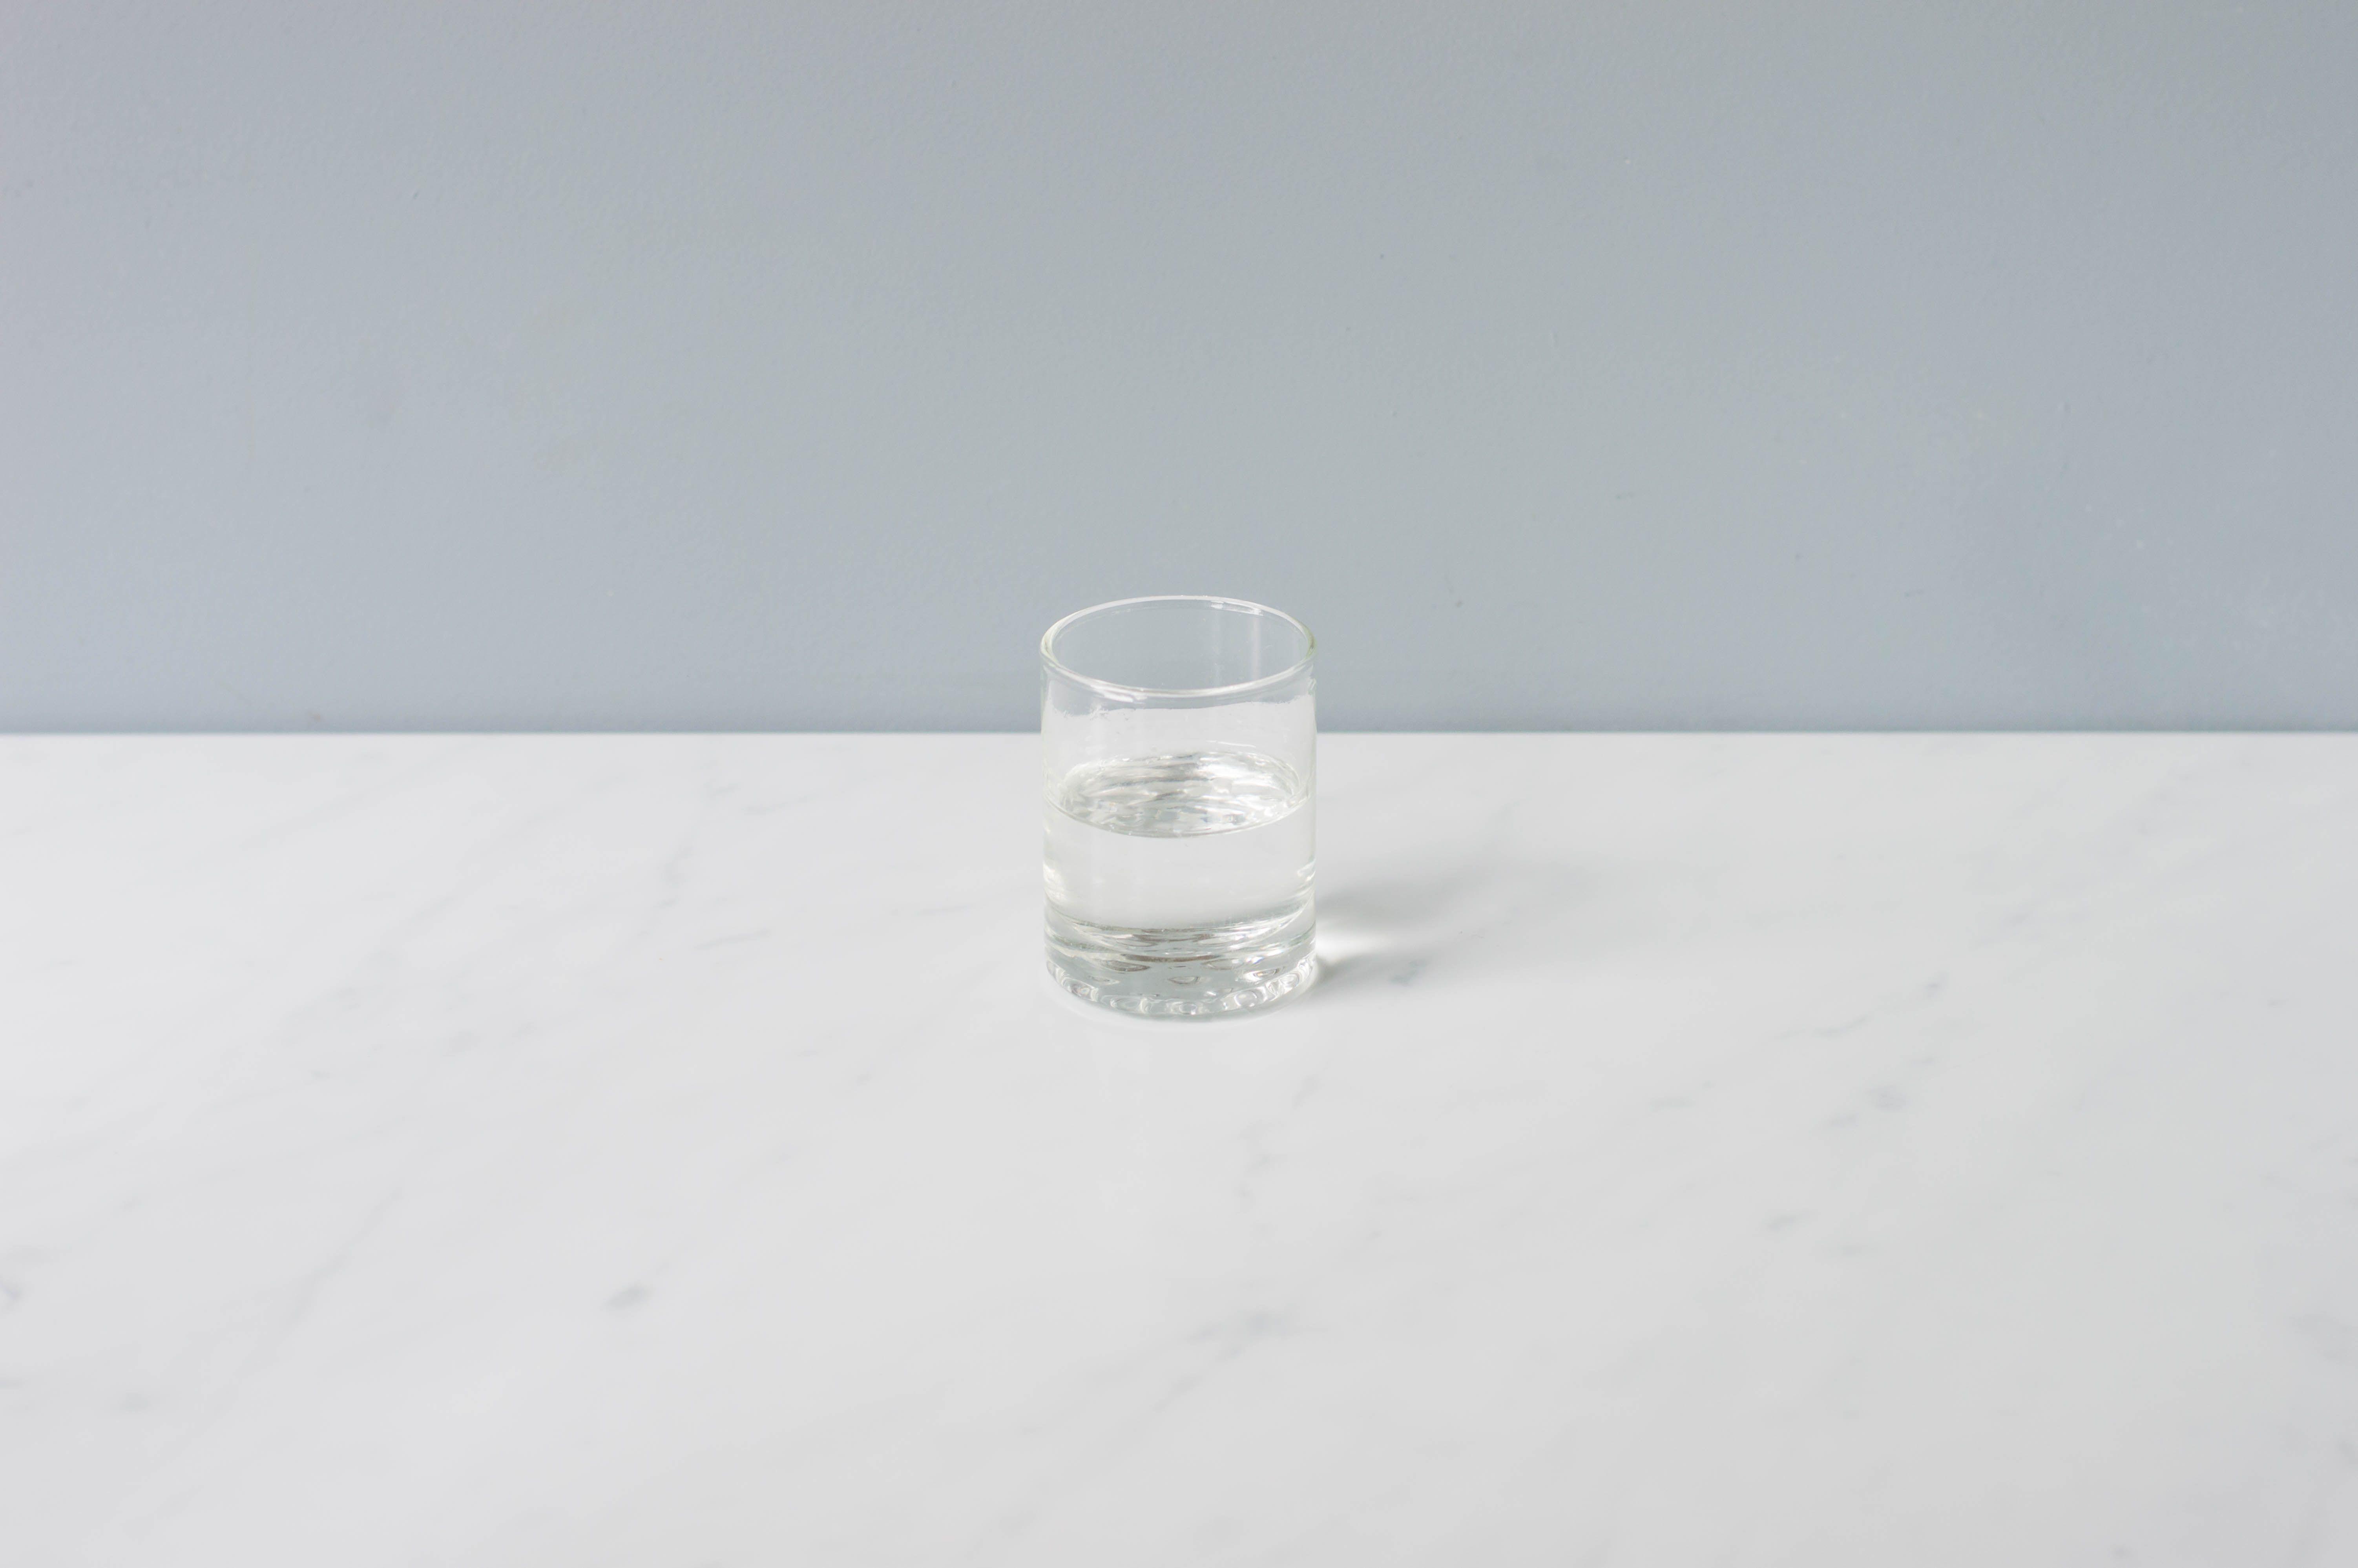 Add sambuca to a glass for a Slippery Nipple shot